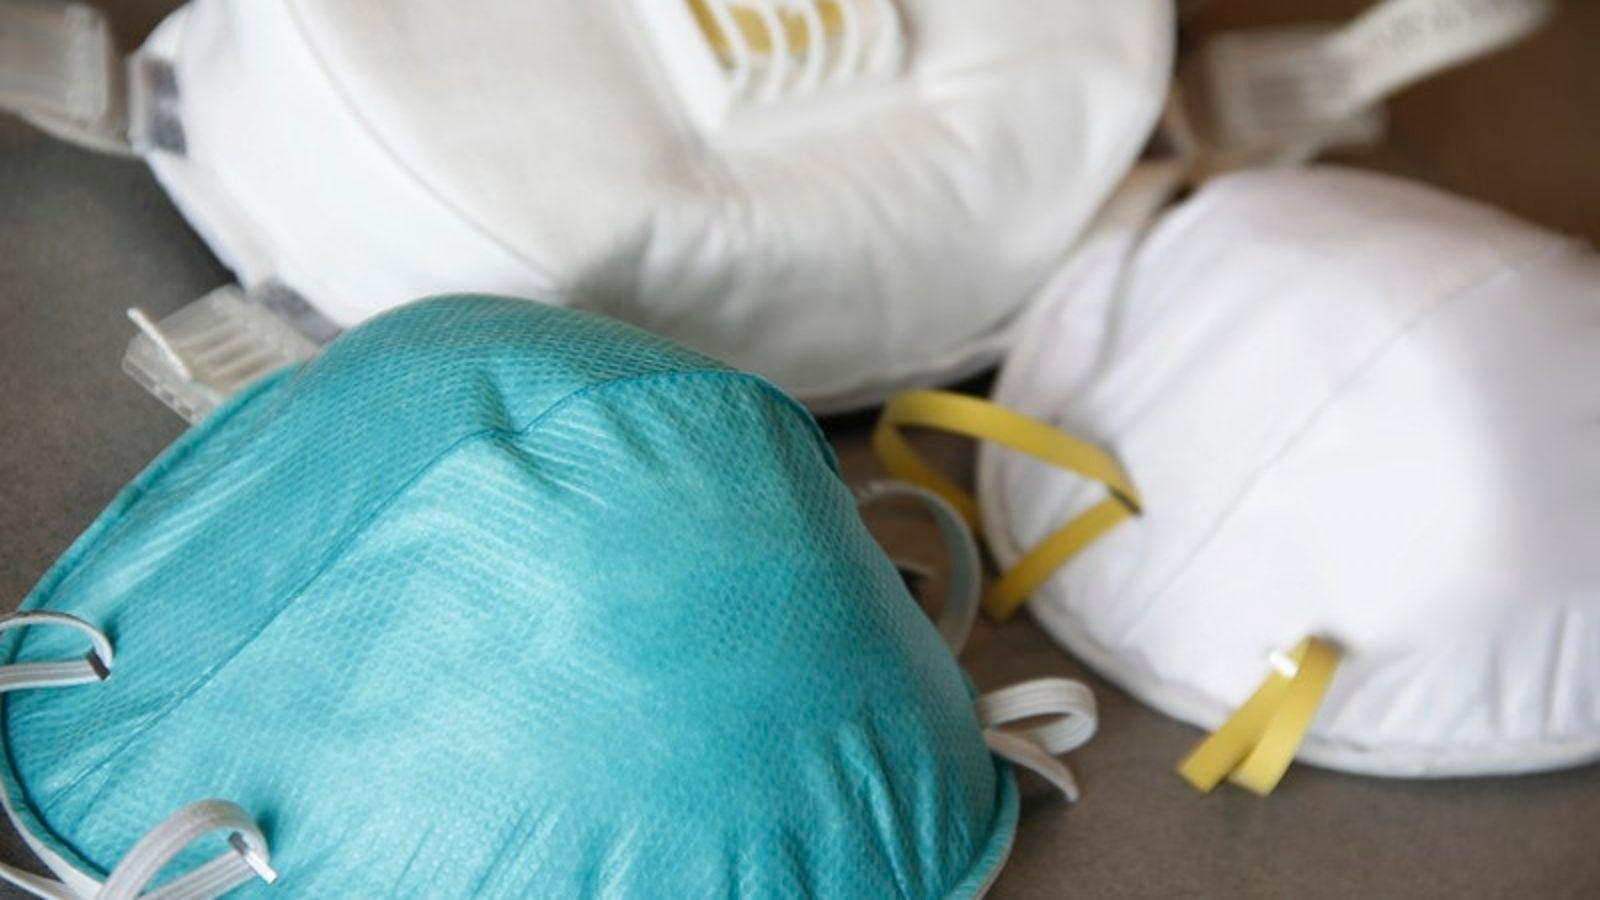 Three N95 respirator masks